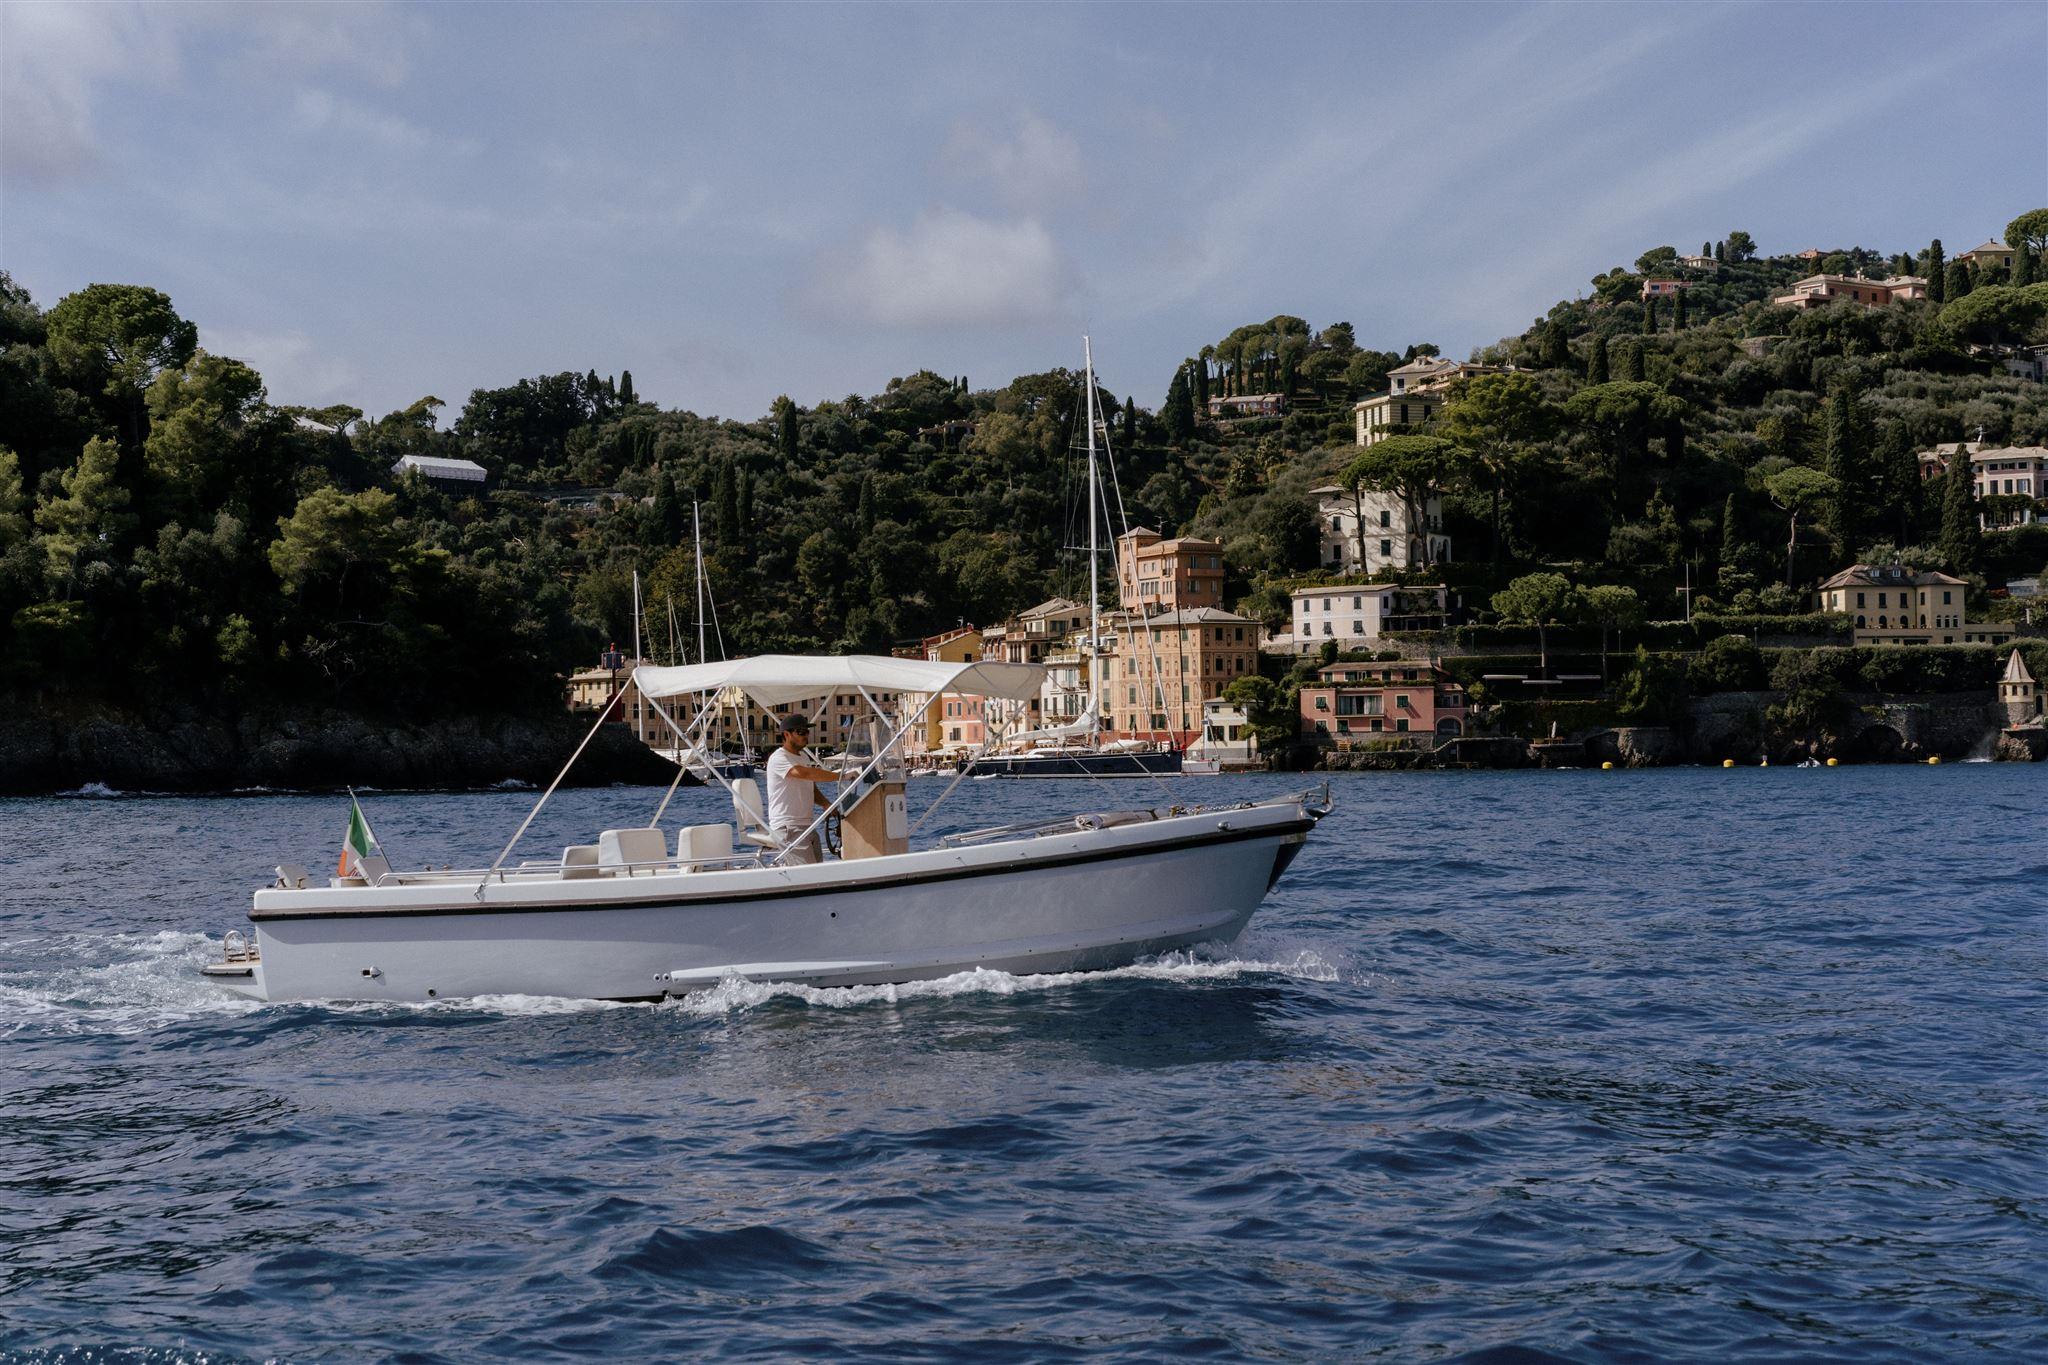 Cesare Charter Portofino - boat for maritime tour, charter and transfer